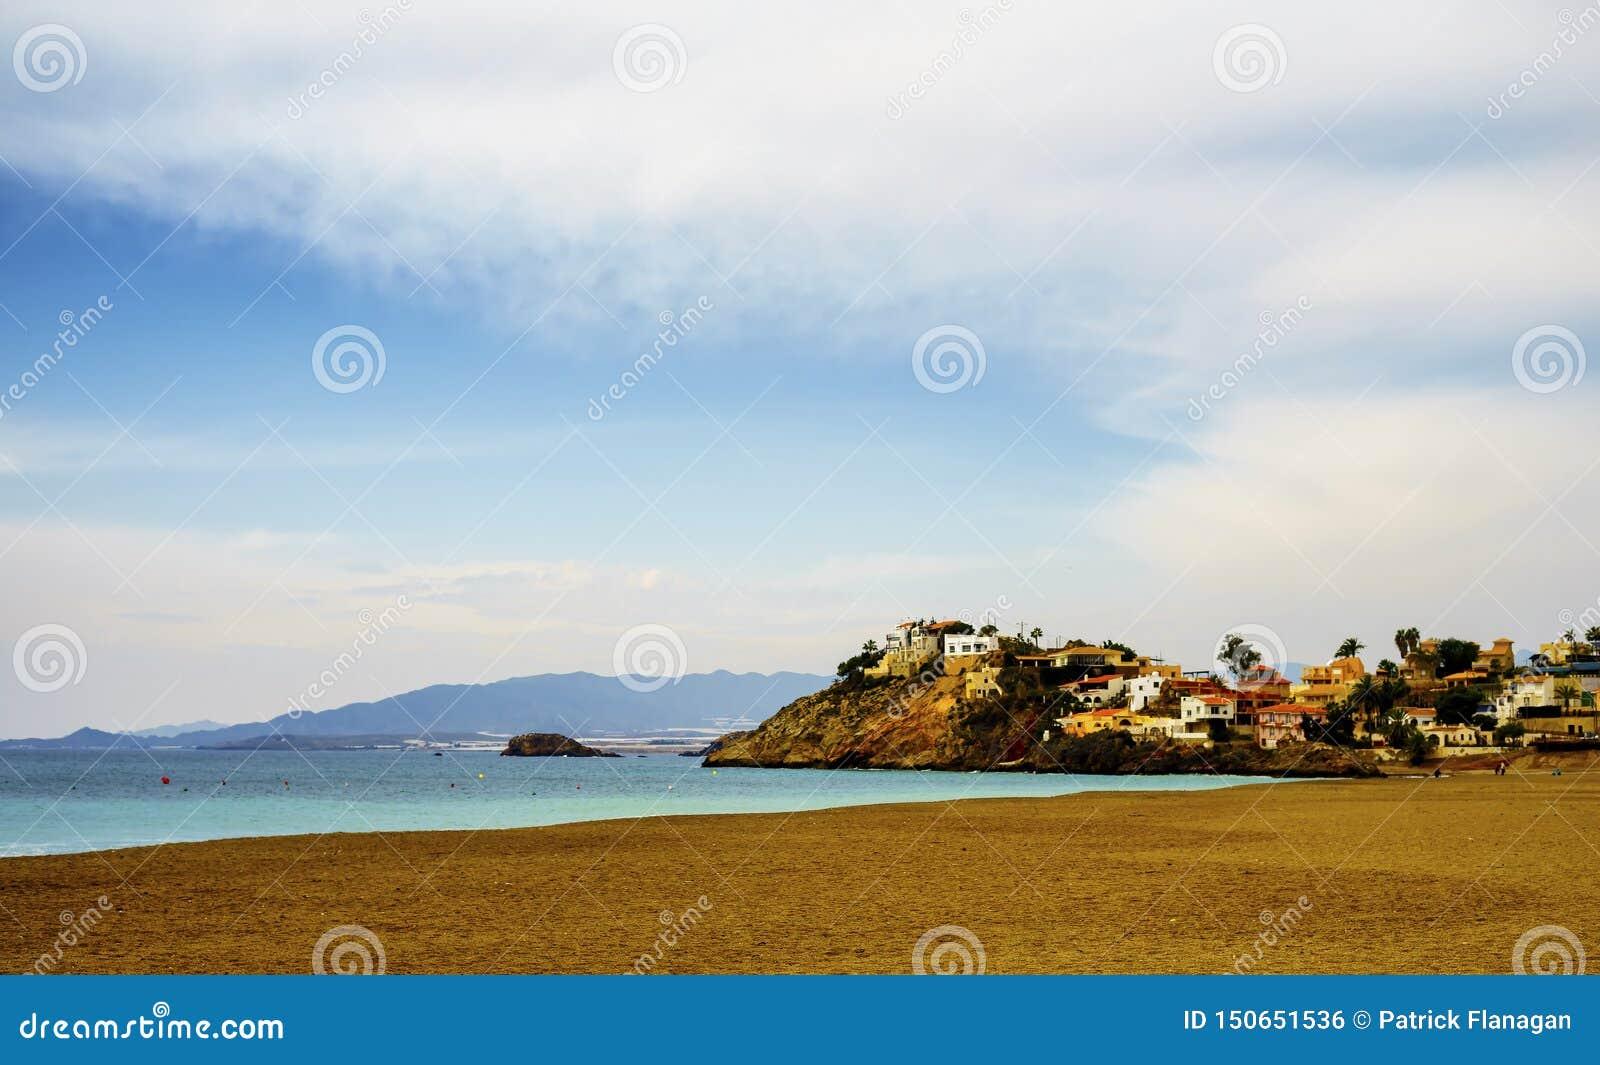 A seascape from Bolnuevo,Murcia,Spain